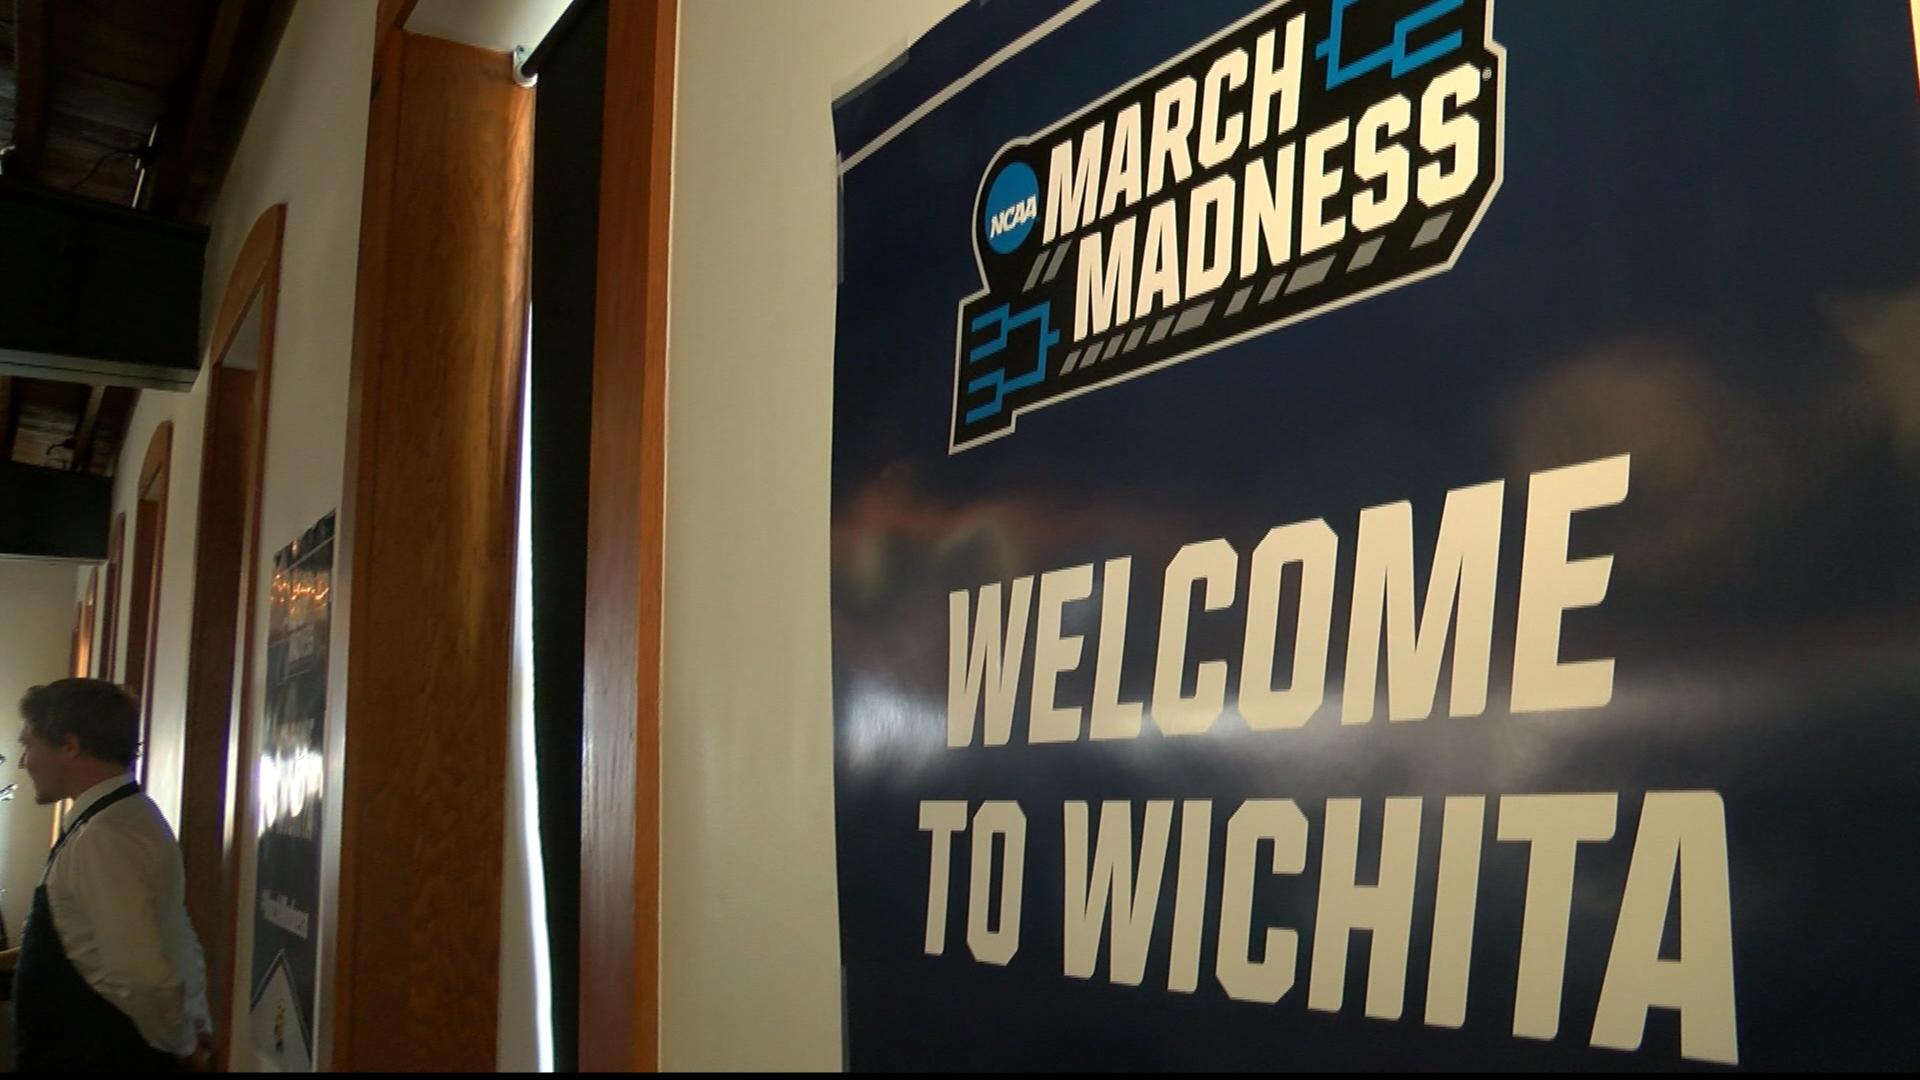 NCAA Welcome to Wichita